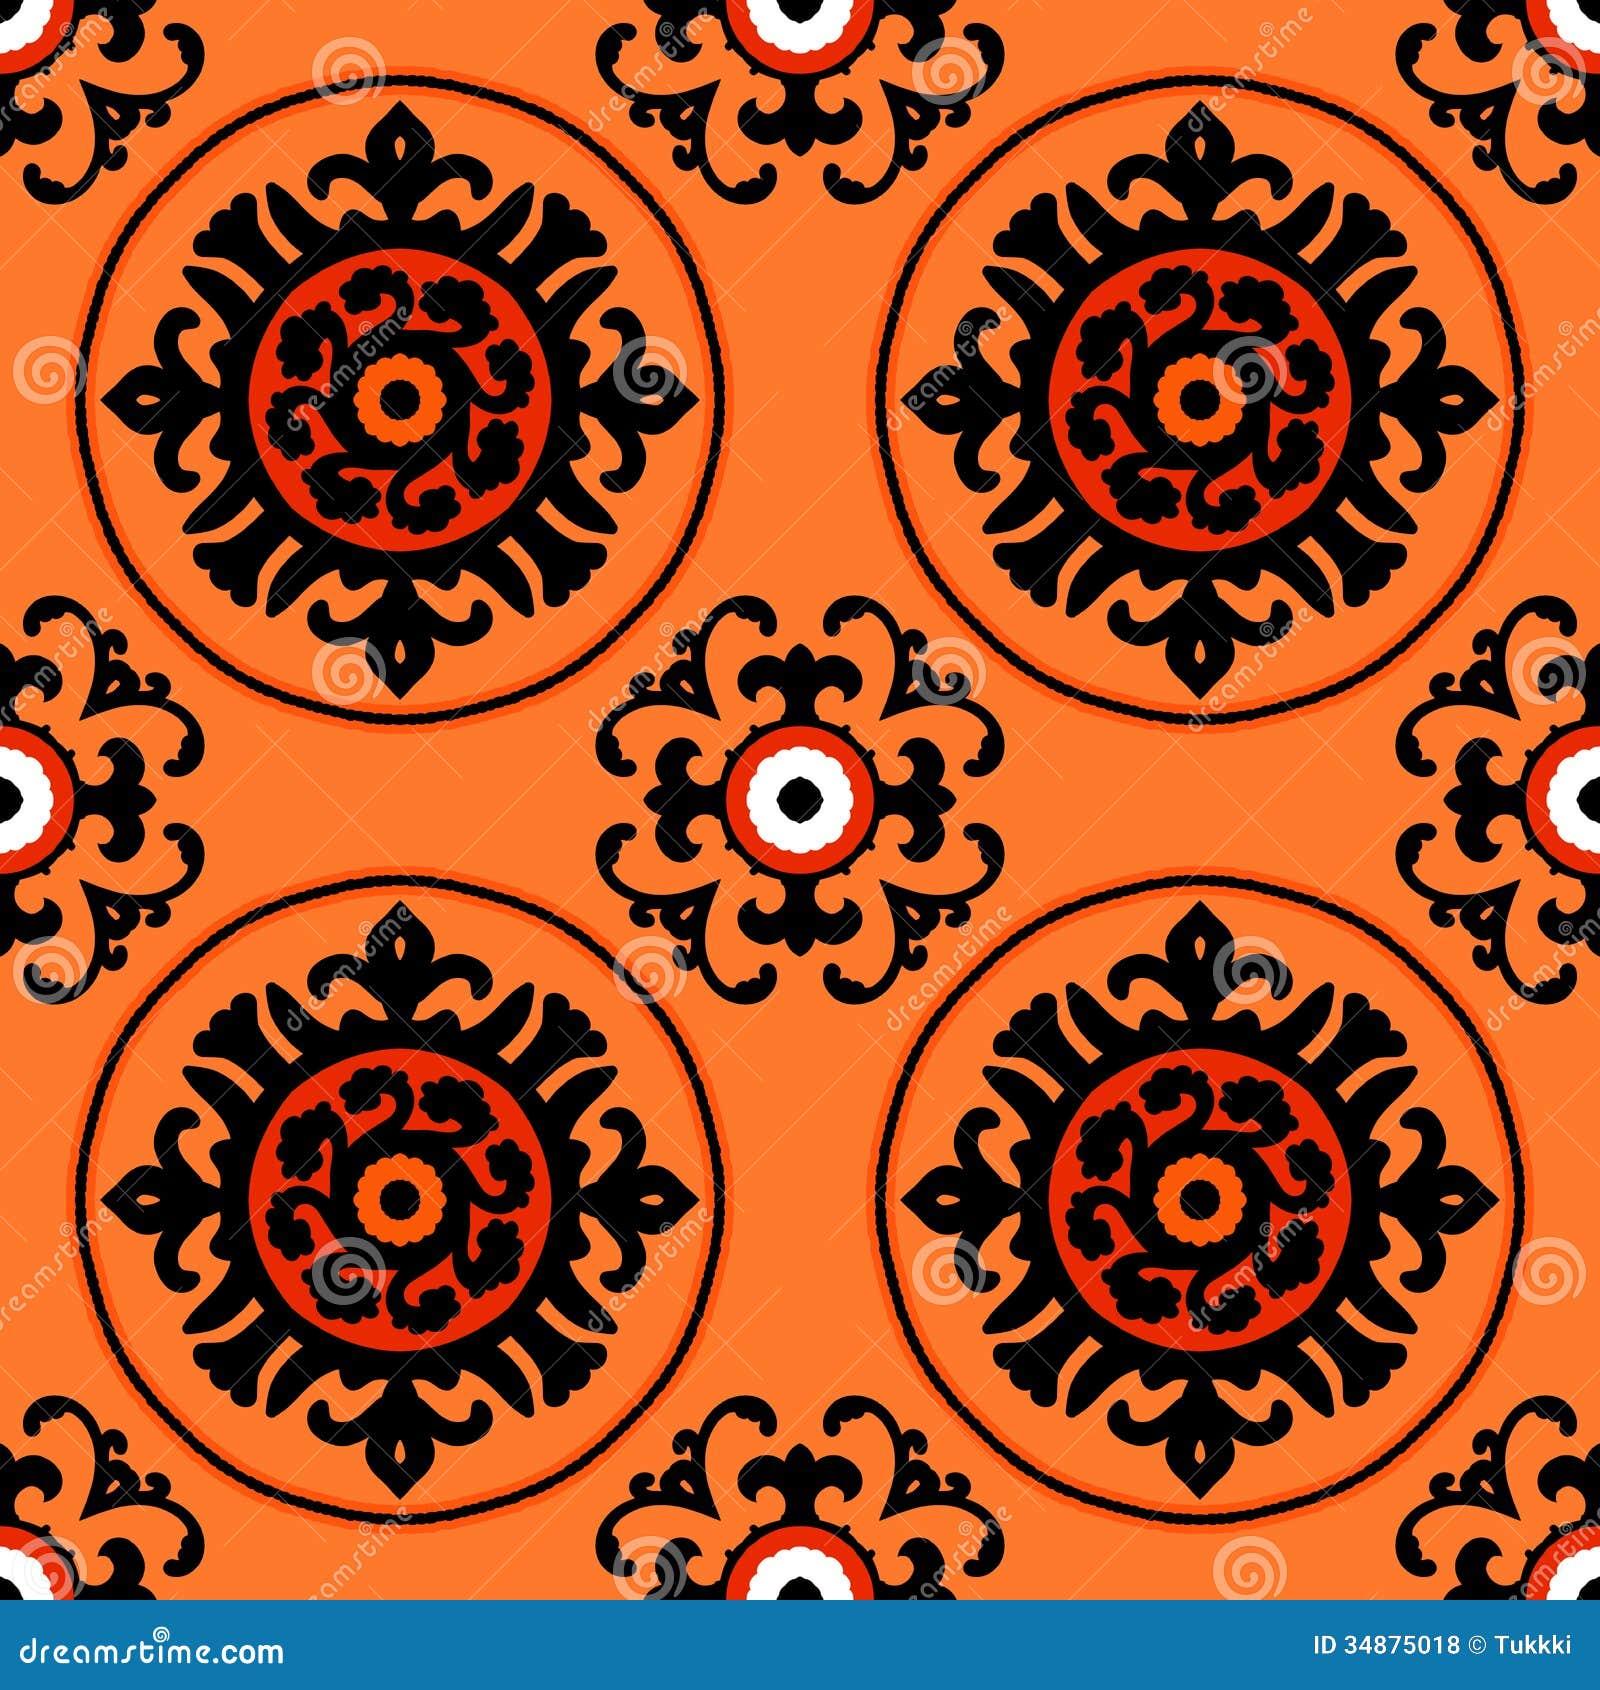 Suzani Pattern Royalty Free Stock Photos Image 34875018